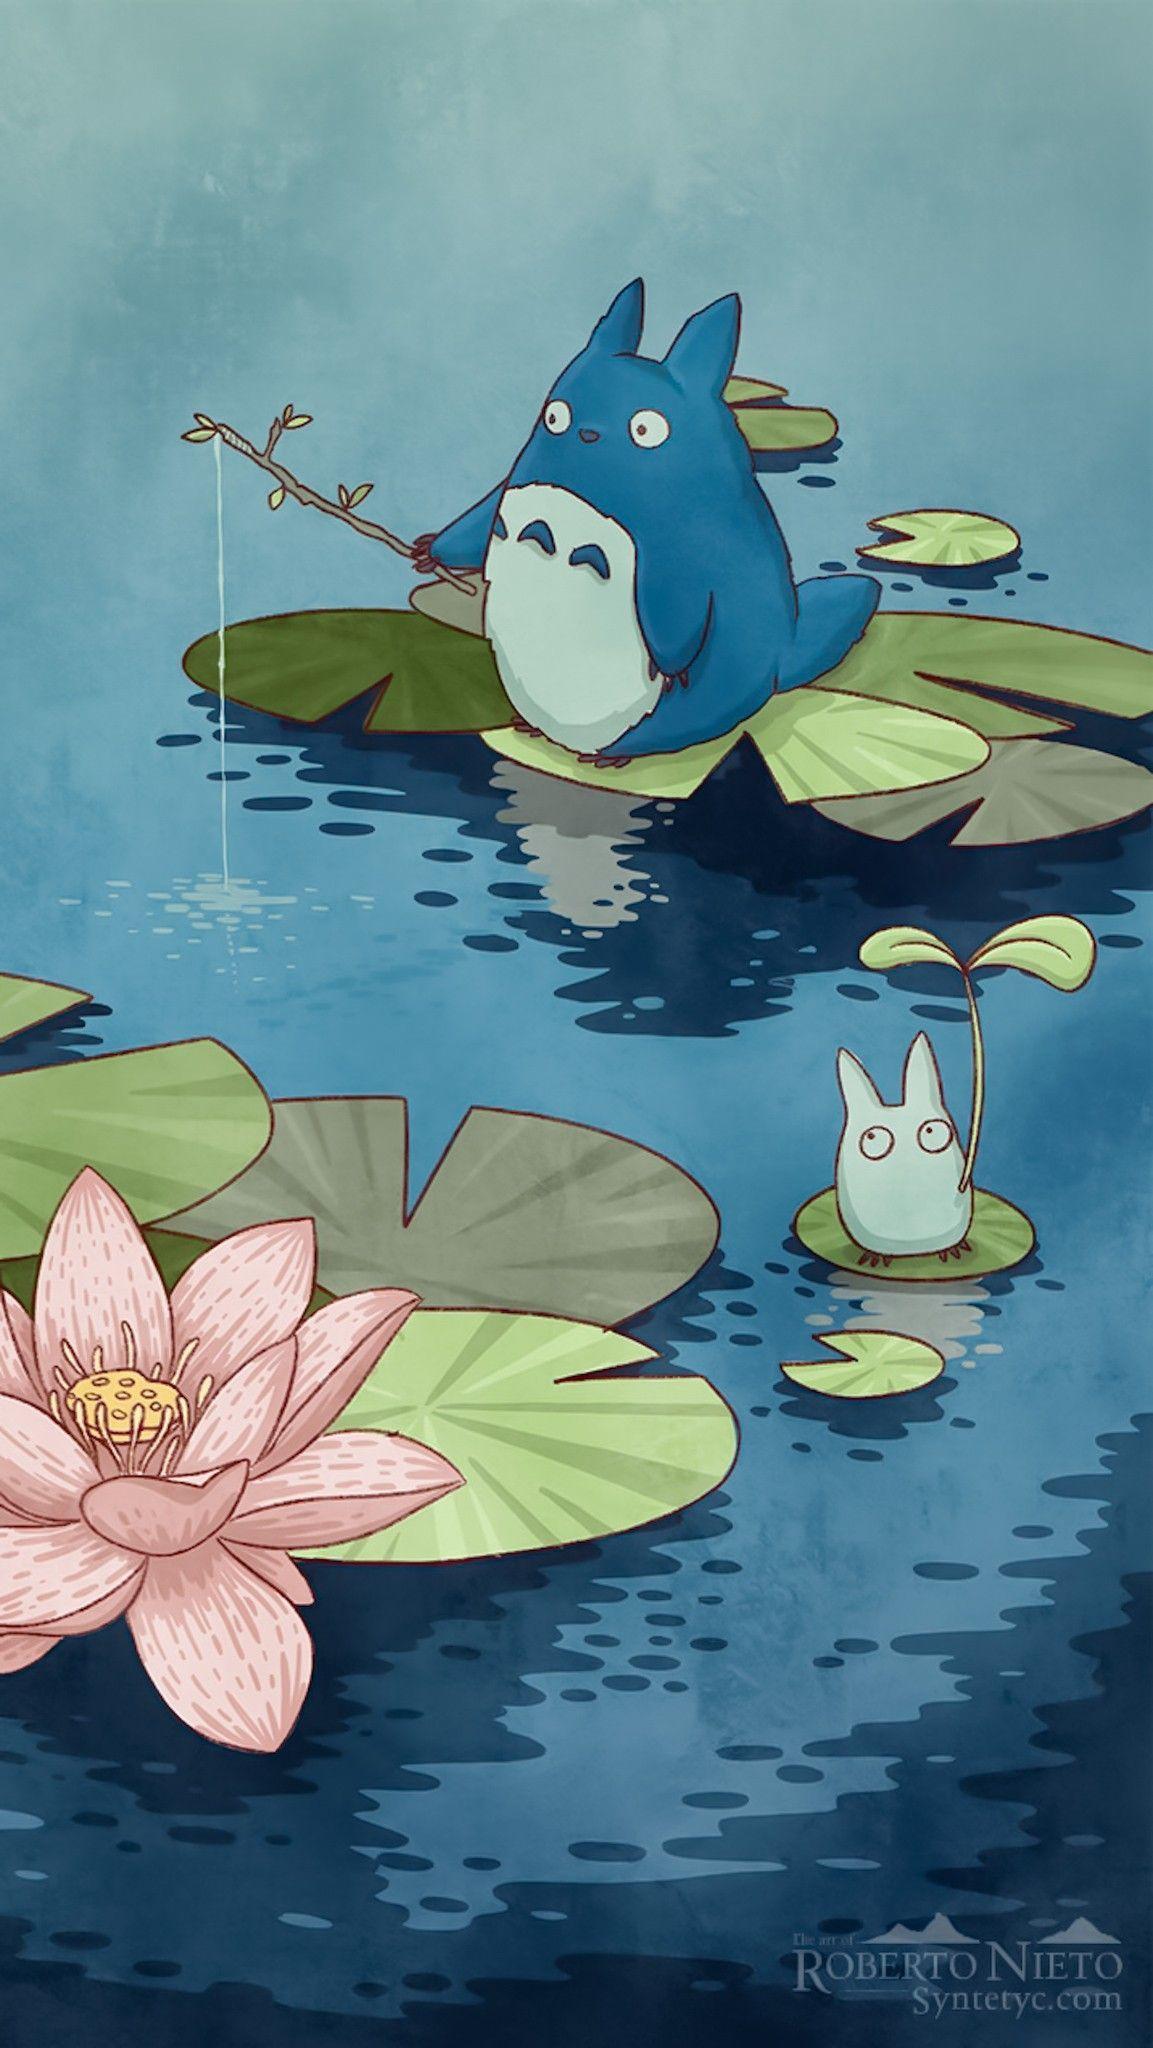 Pin By Vanessa Carrillo On Manga Ghibli Artwork Anime Wallpaper Ghibli Art